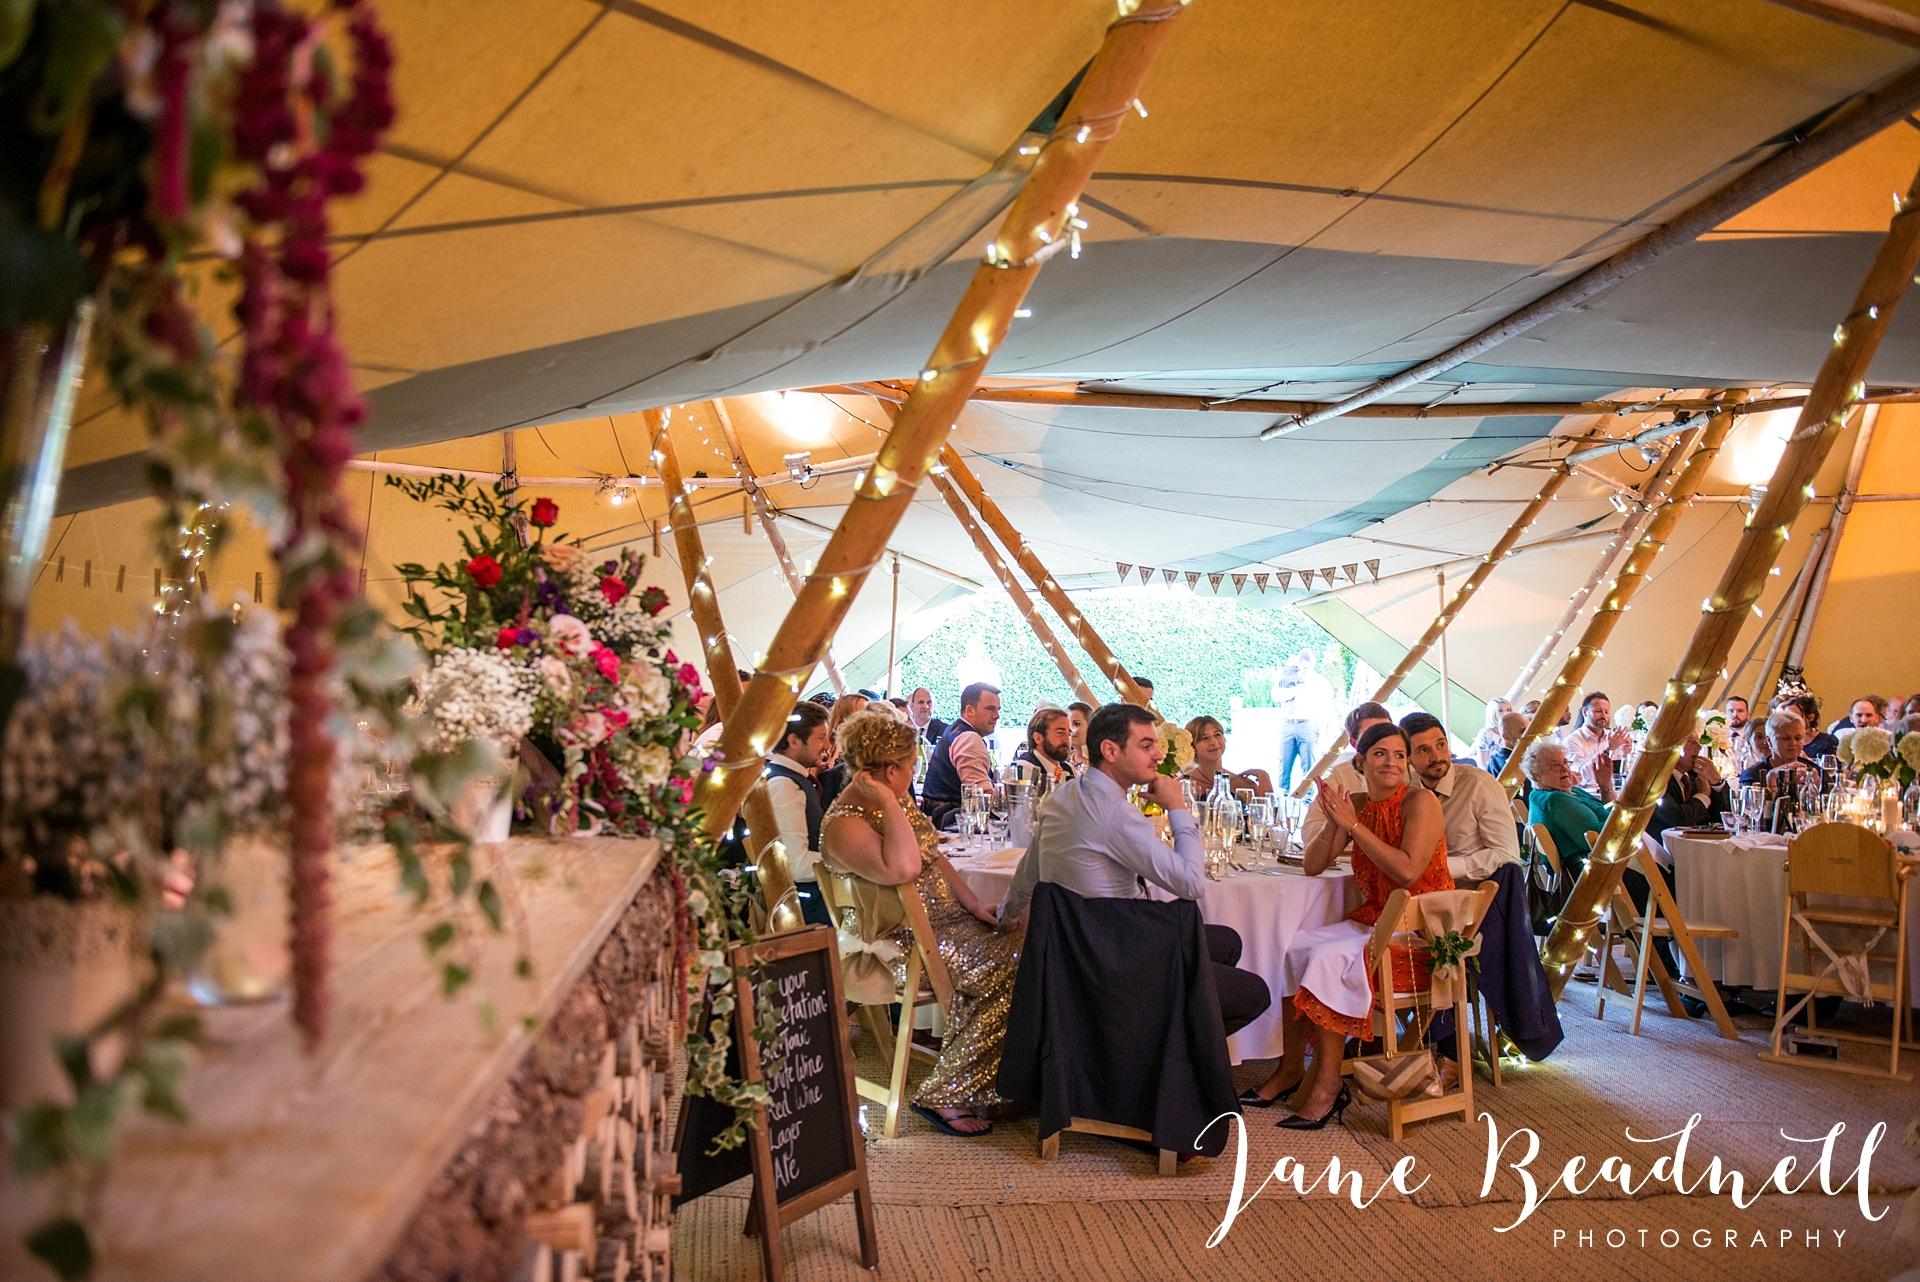 fine-art-wedding-photographer-jane-beadnell-yorkshire-wedding-photographer_0143